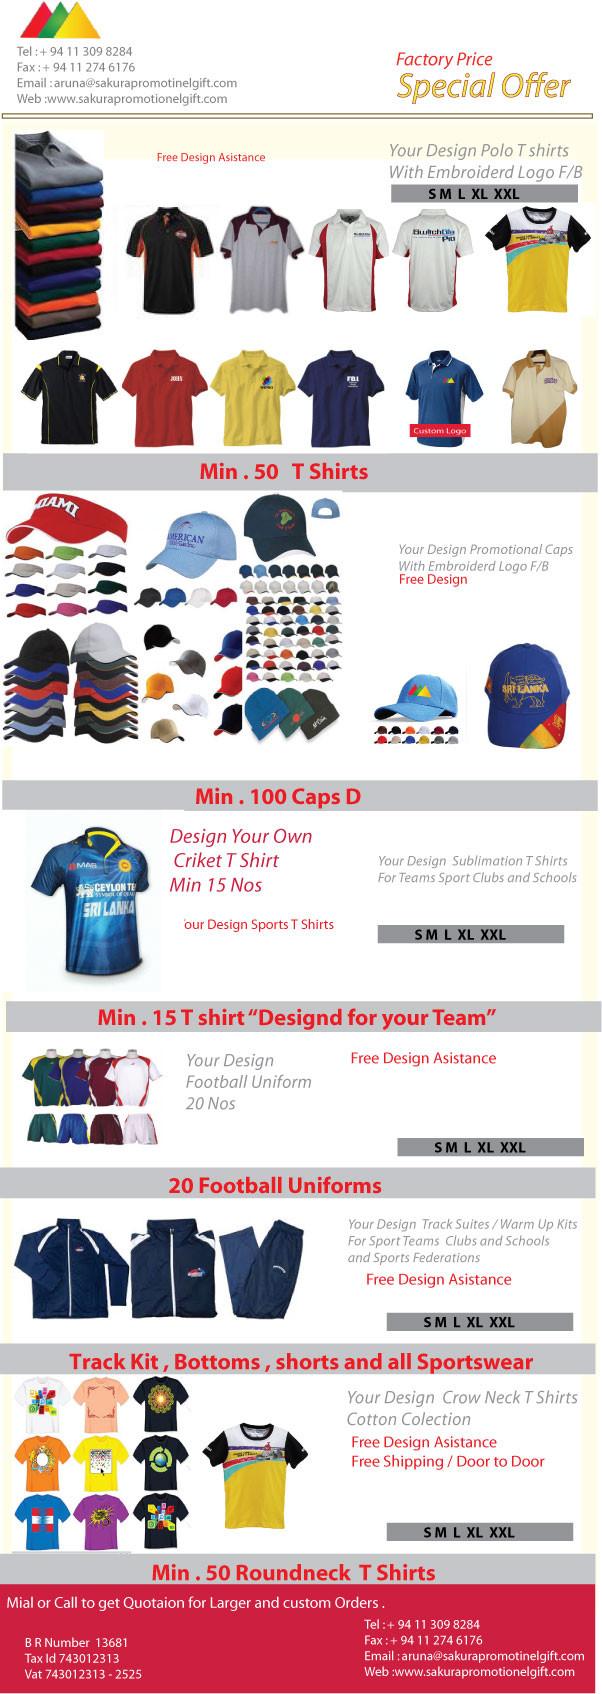 School shirt design your own - School T Shirts Sports Acclivity Uniform